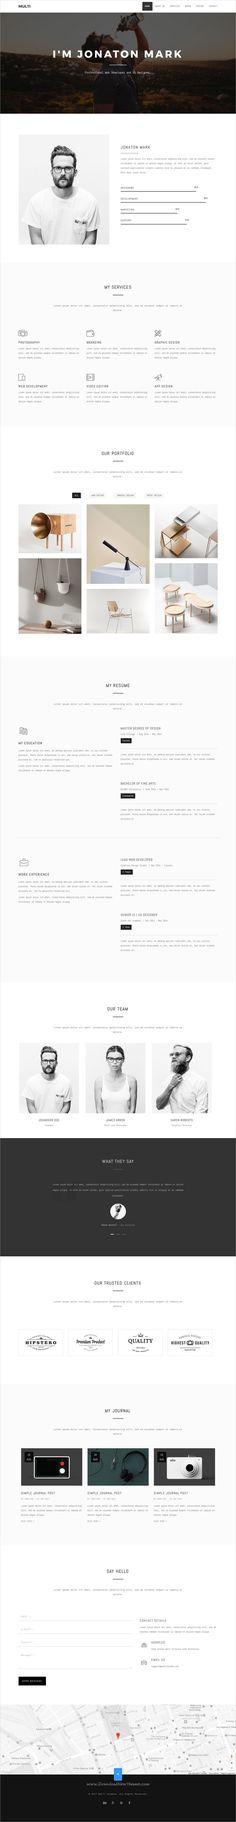 Mun Cut Personal Portfolio HTML Template Template for resume - resume templates html